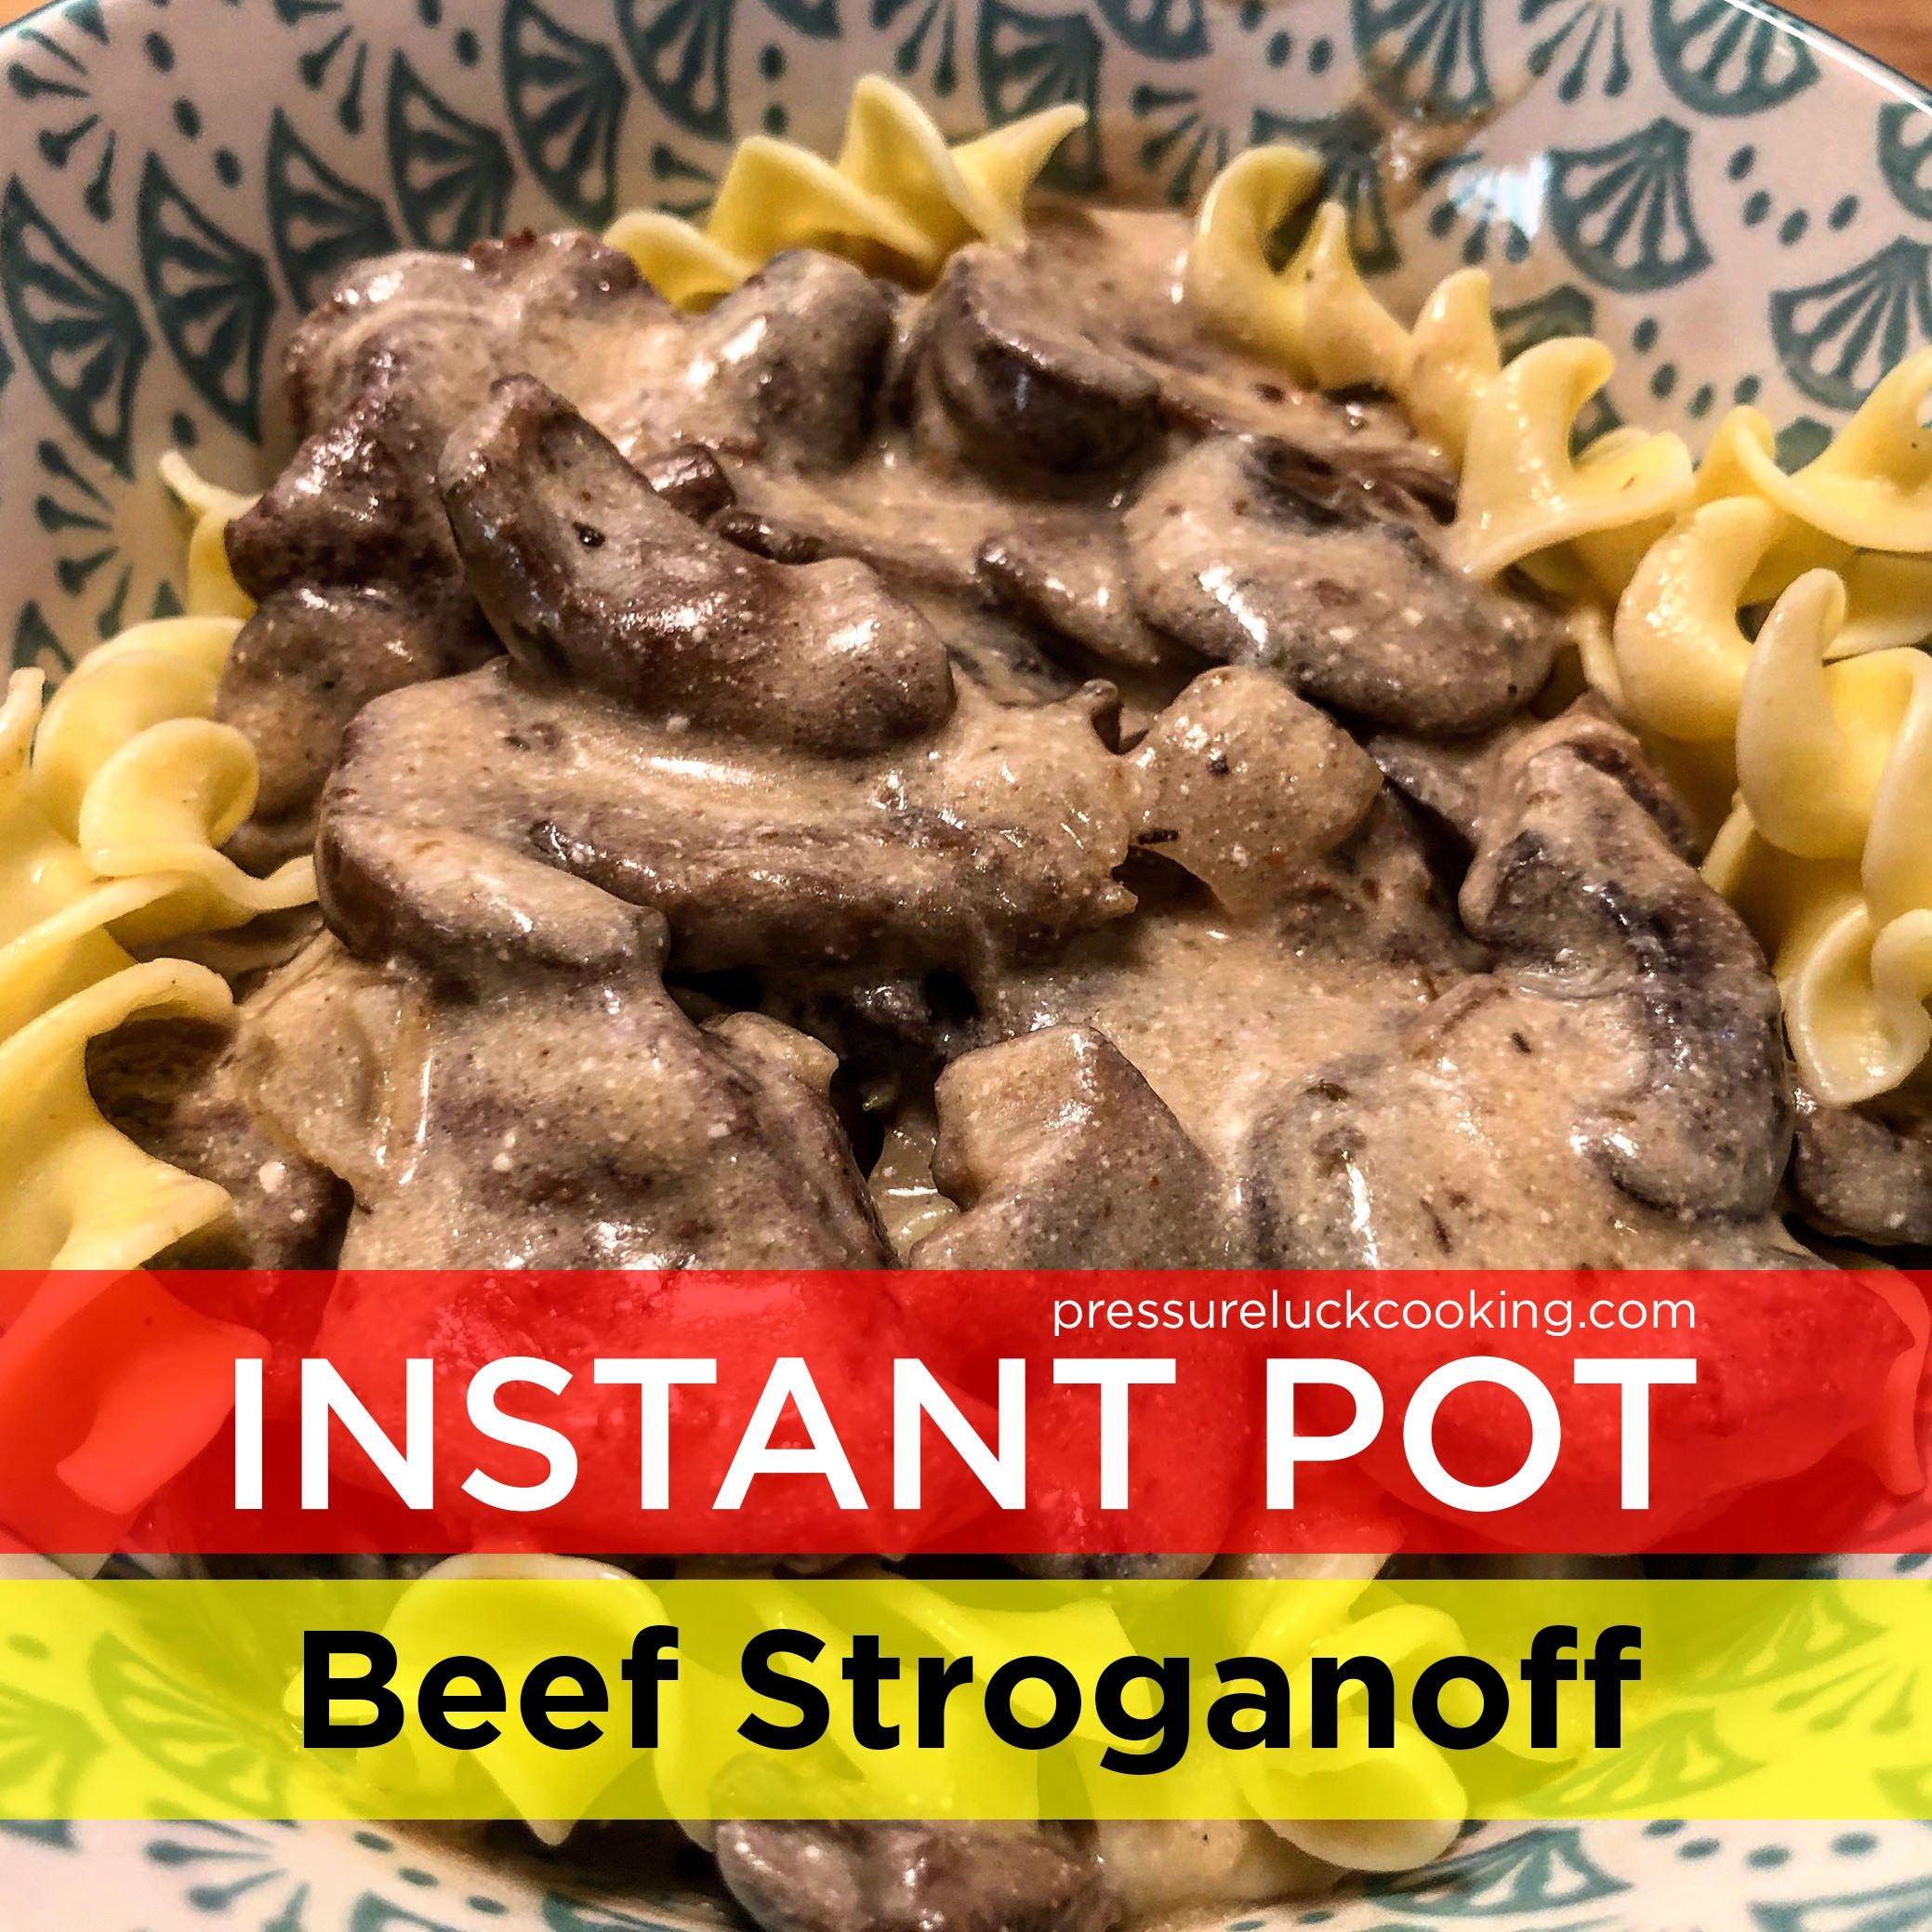 Instant Pot Beef Stroganoff I Heart Eating Recipe Beef Stroganoff Instant Pot Recipe Instant Pot Dinner Recipes Beef Stroganoff